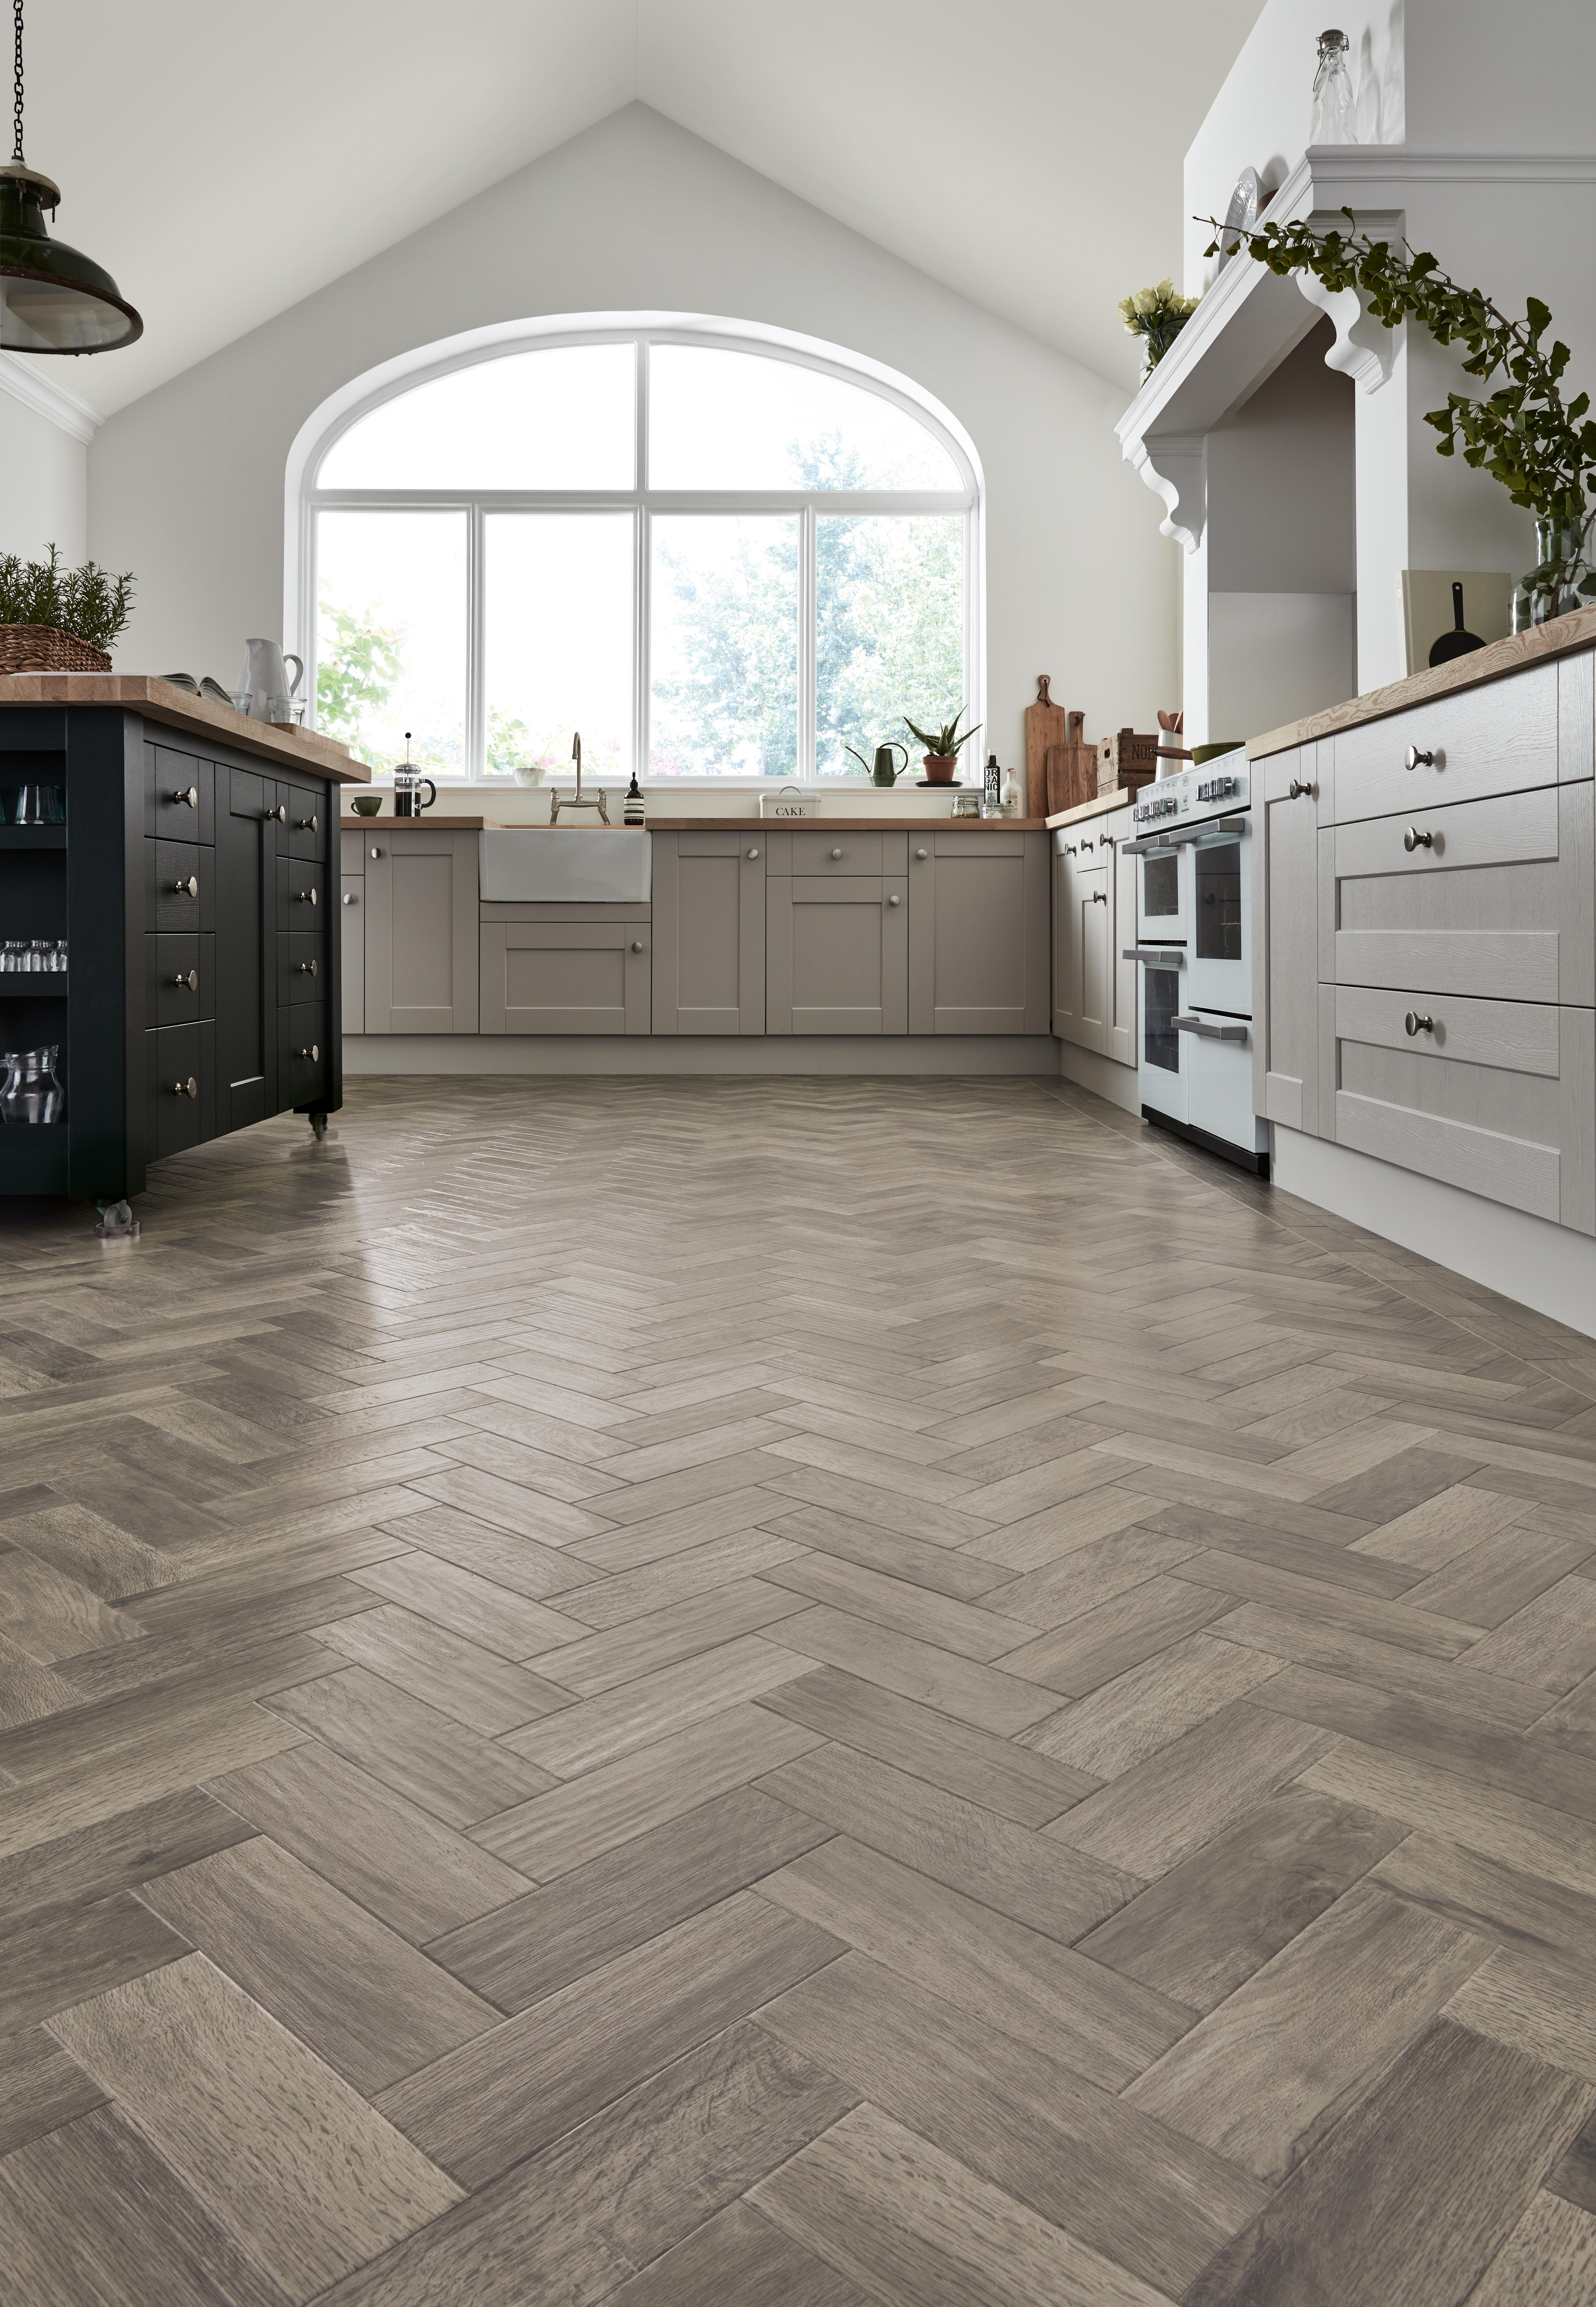 Karndean Flooring In 2020 Karndean Flooring Vinyl Flooring Amtico Flooring Kitchen